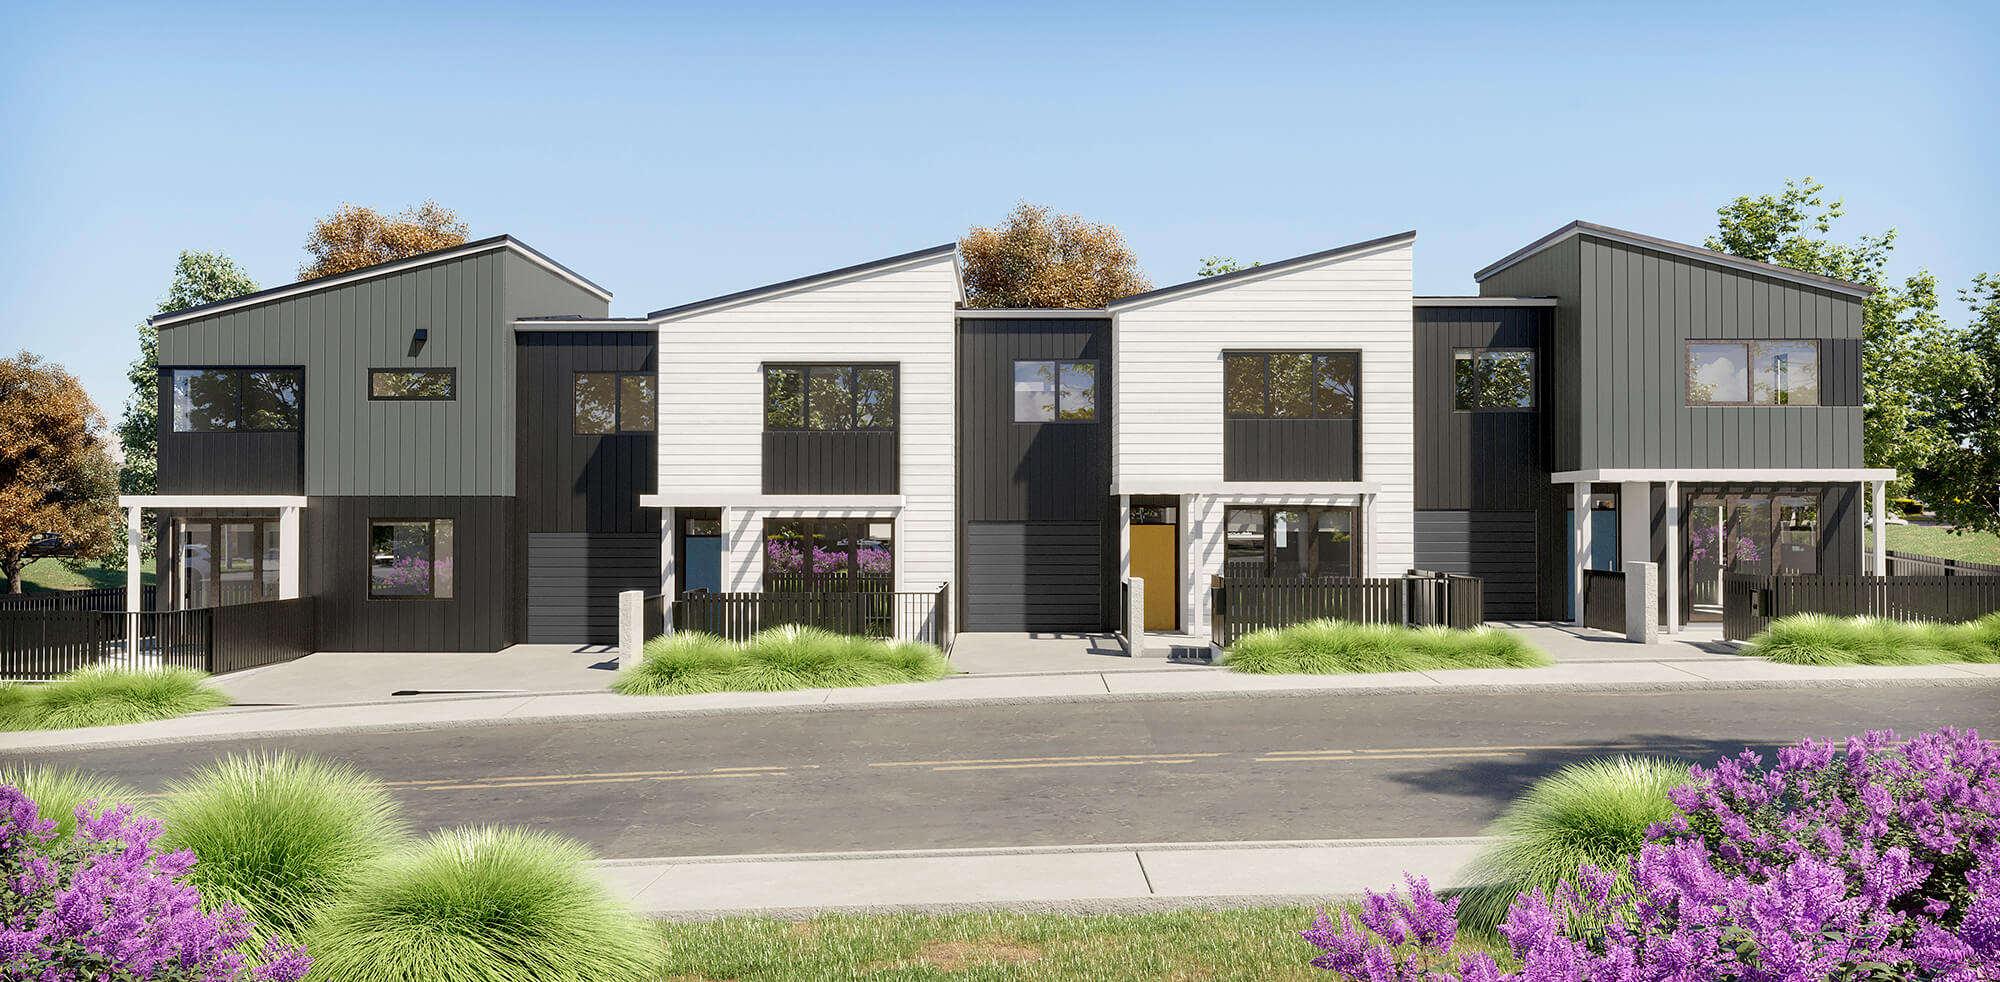 Northcote 品质全新两房$60万起 / 三房$65万起 / 全幅地永久产权城市屋 / 步行至Northcote中心和学校 / 距离奥克兰市中心约9公里